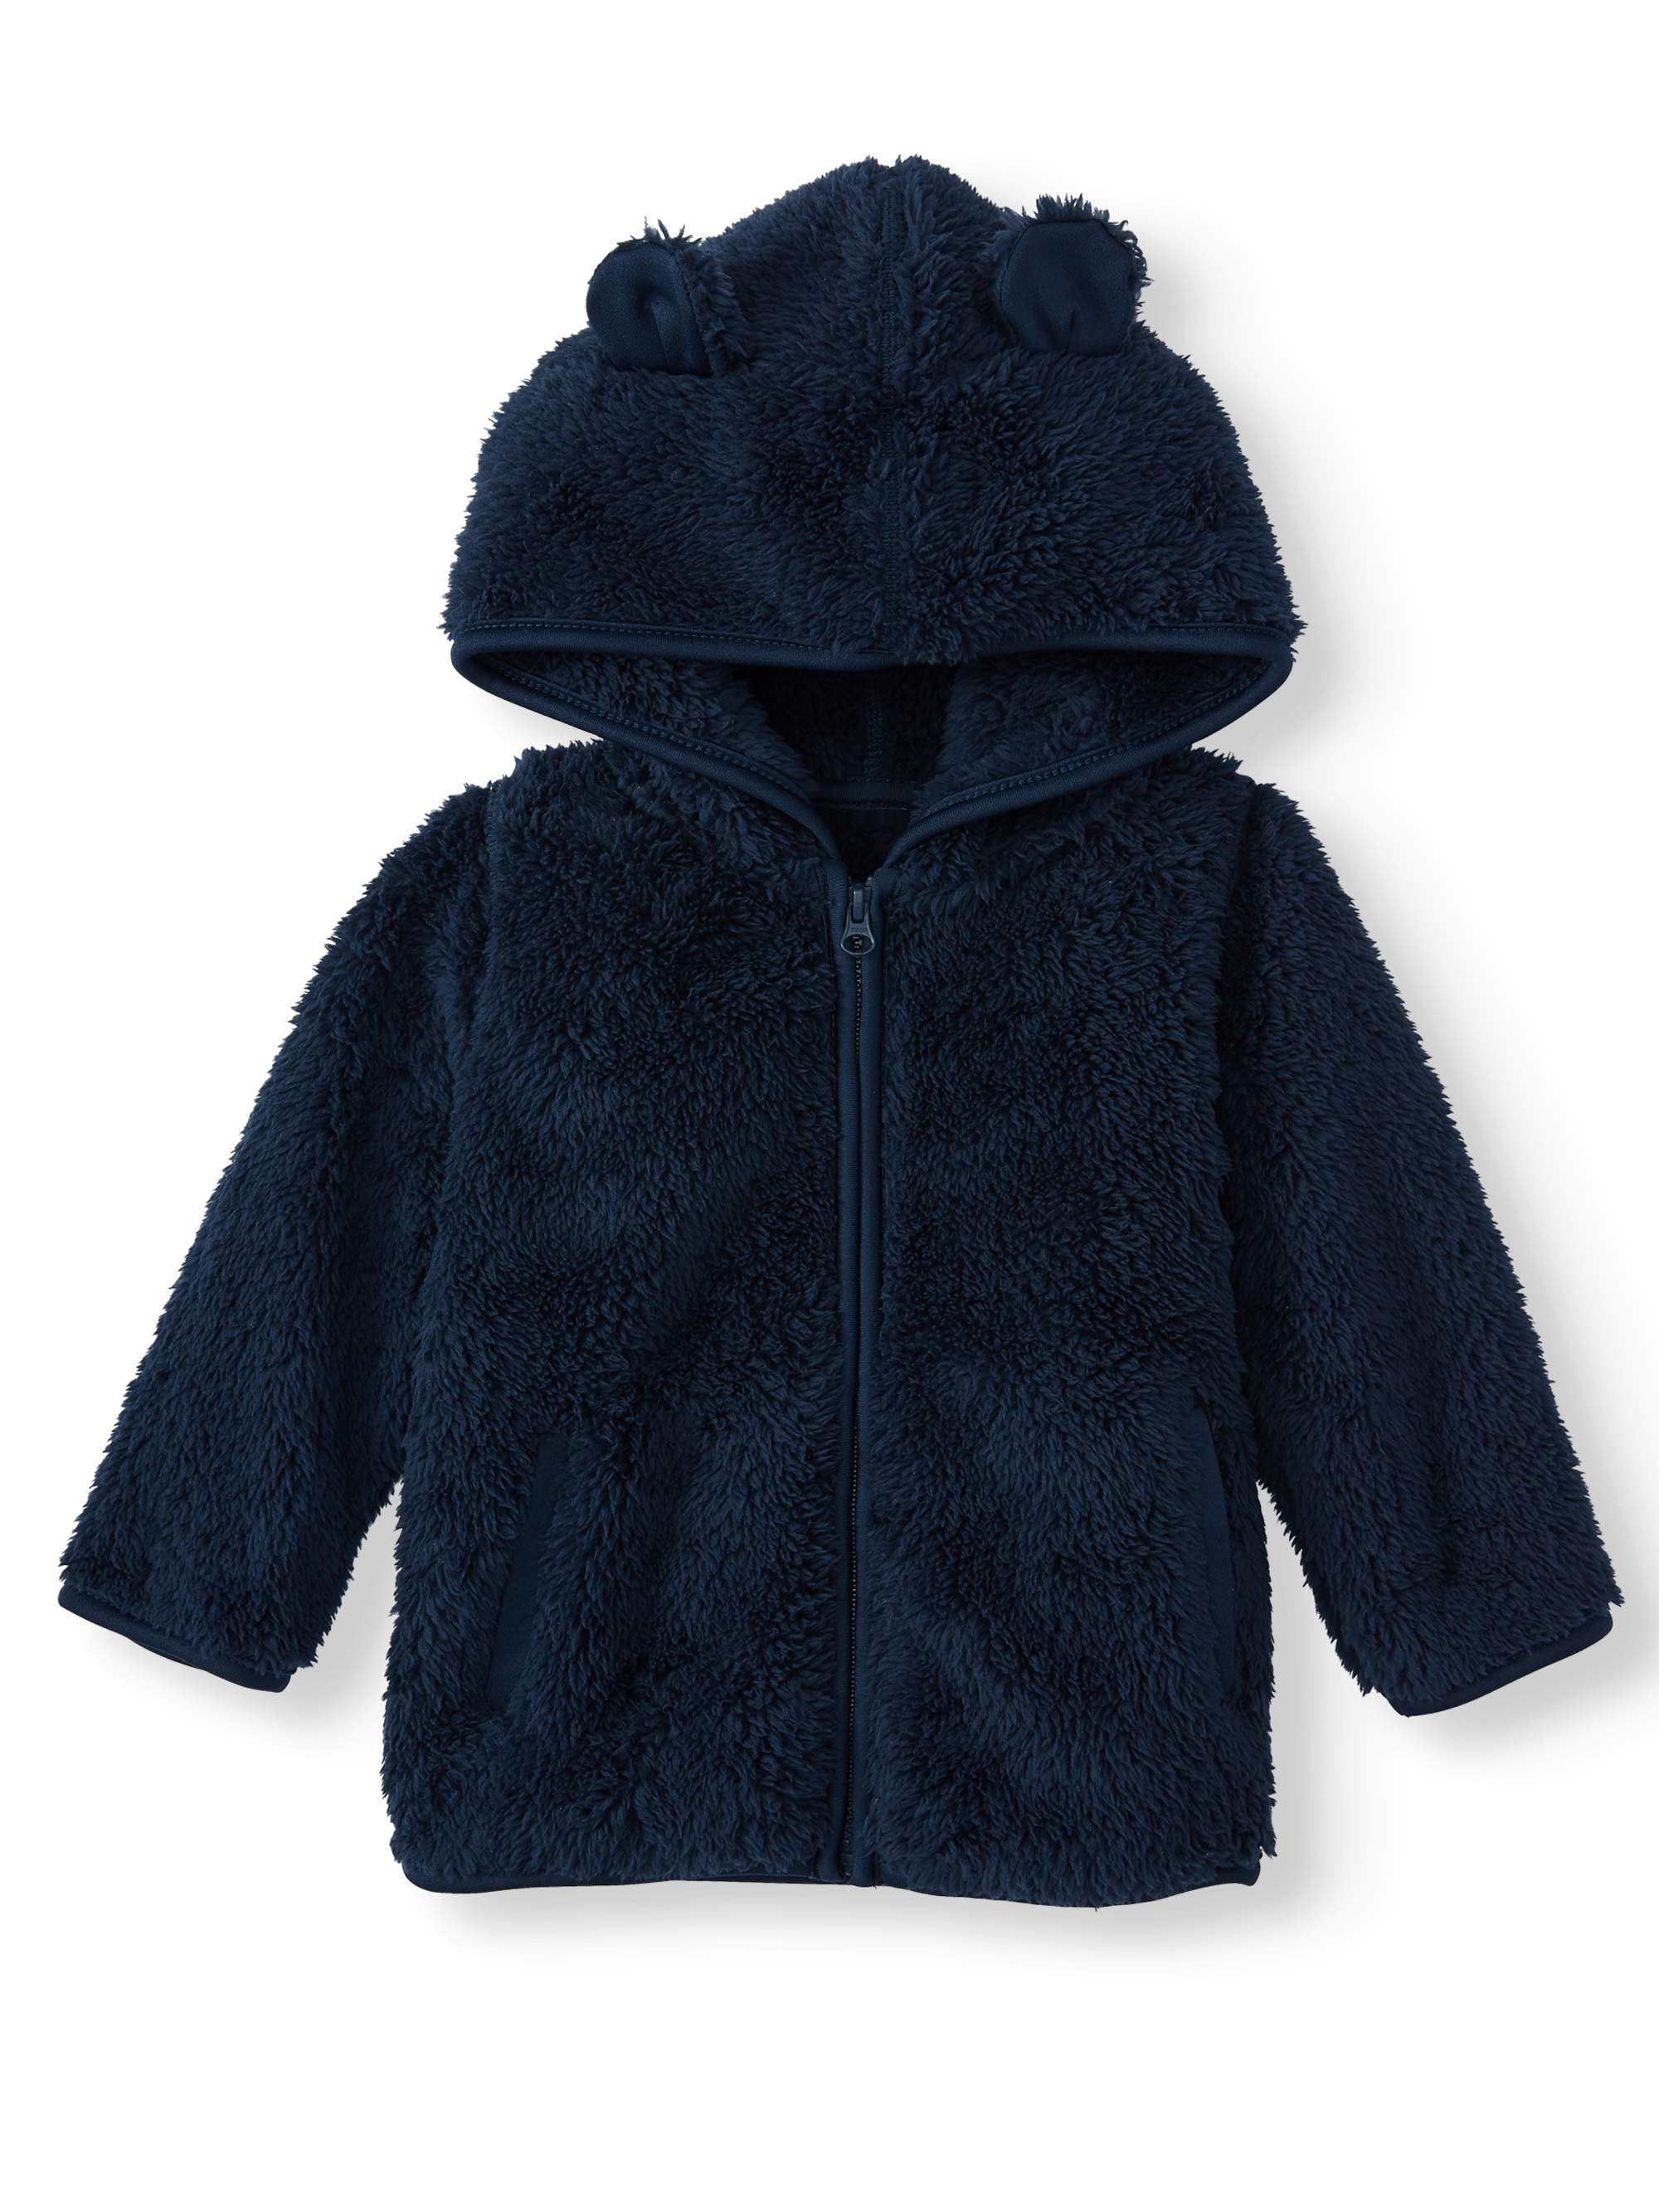 Garanimals Baby Toddler Girl Fleece Top Sweatshirt Graphic Tee Glitter Mommy